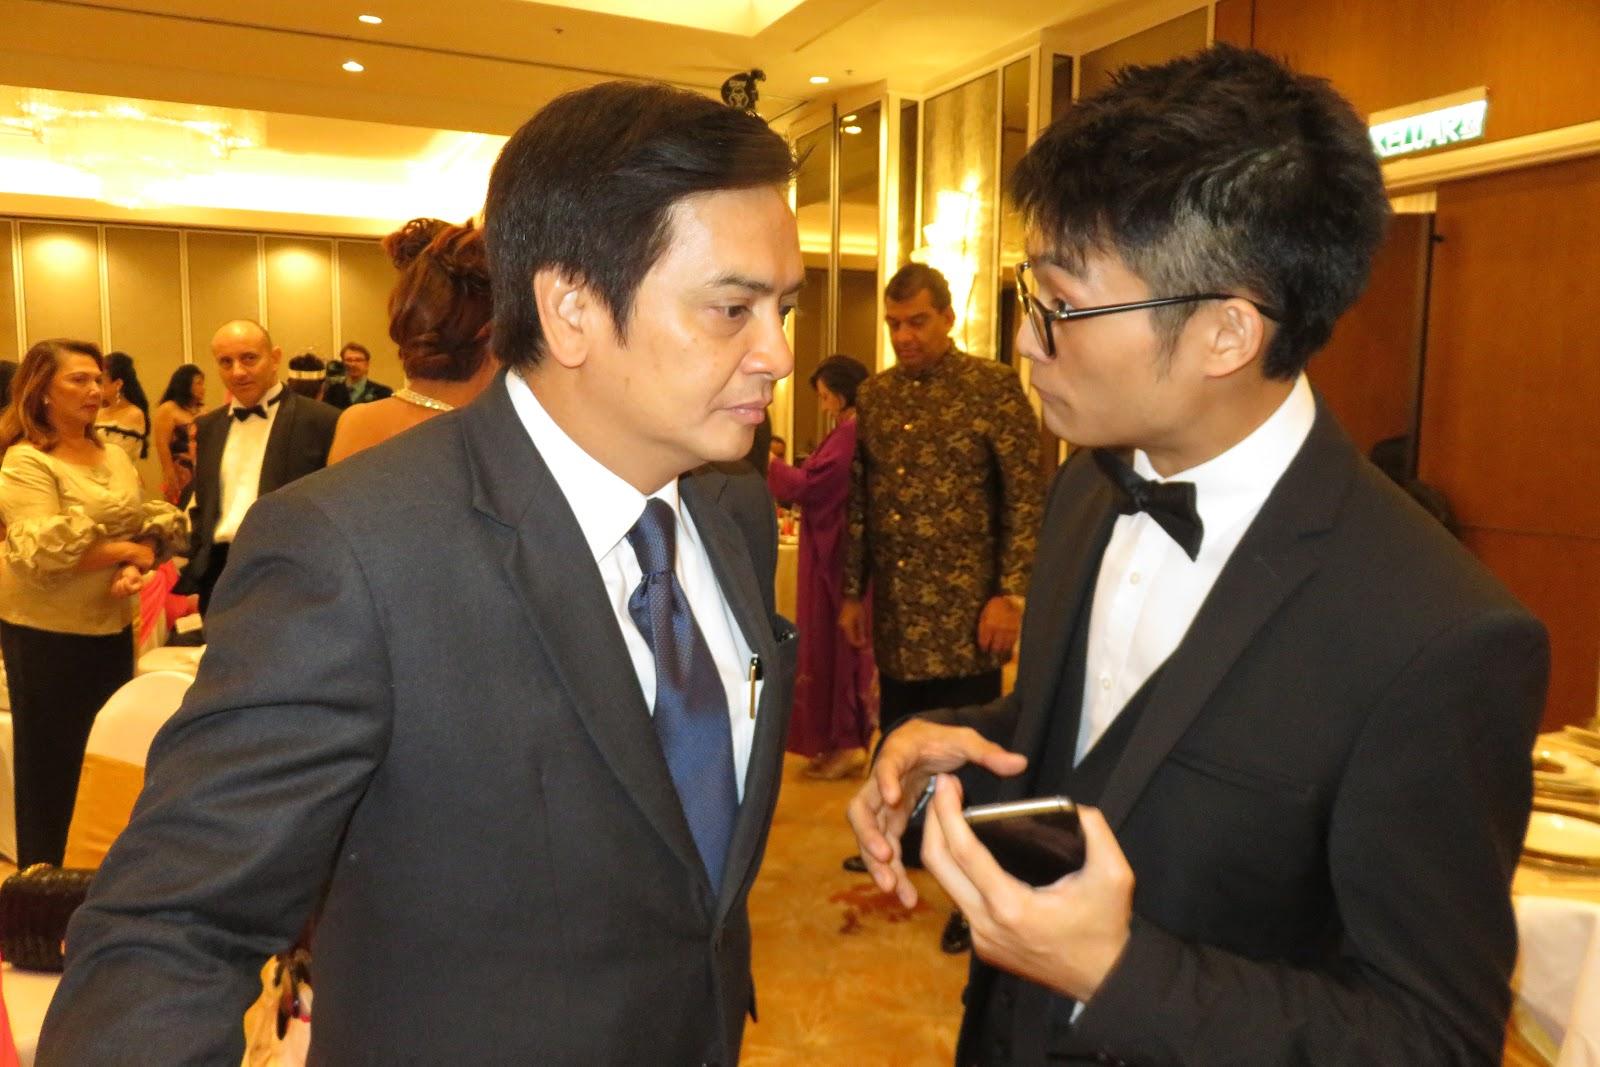 Dato56 Dato Kelenjeridze: Kee Hua Chee Live!: PART 2---HAPPY BIRTHDAY PRINCESS DATO